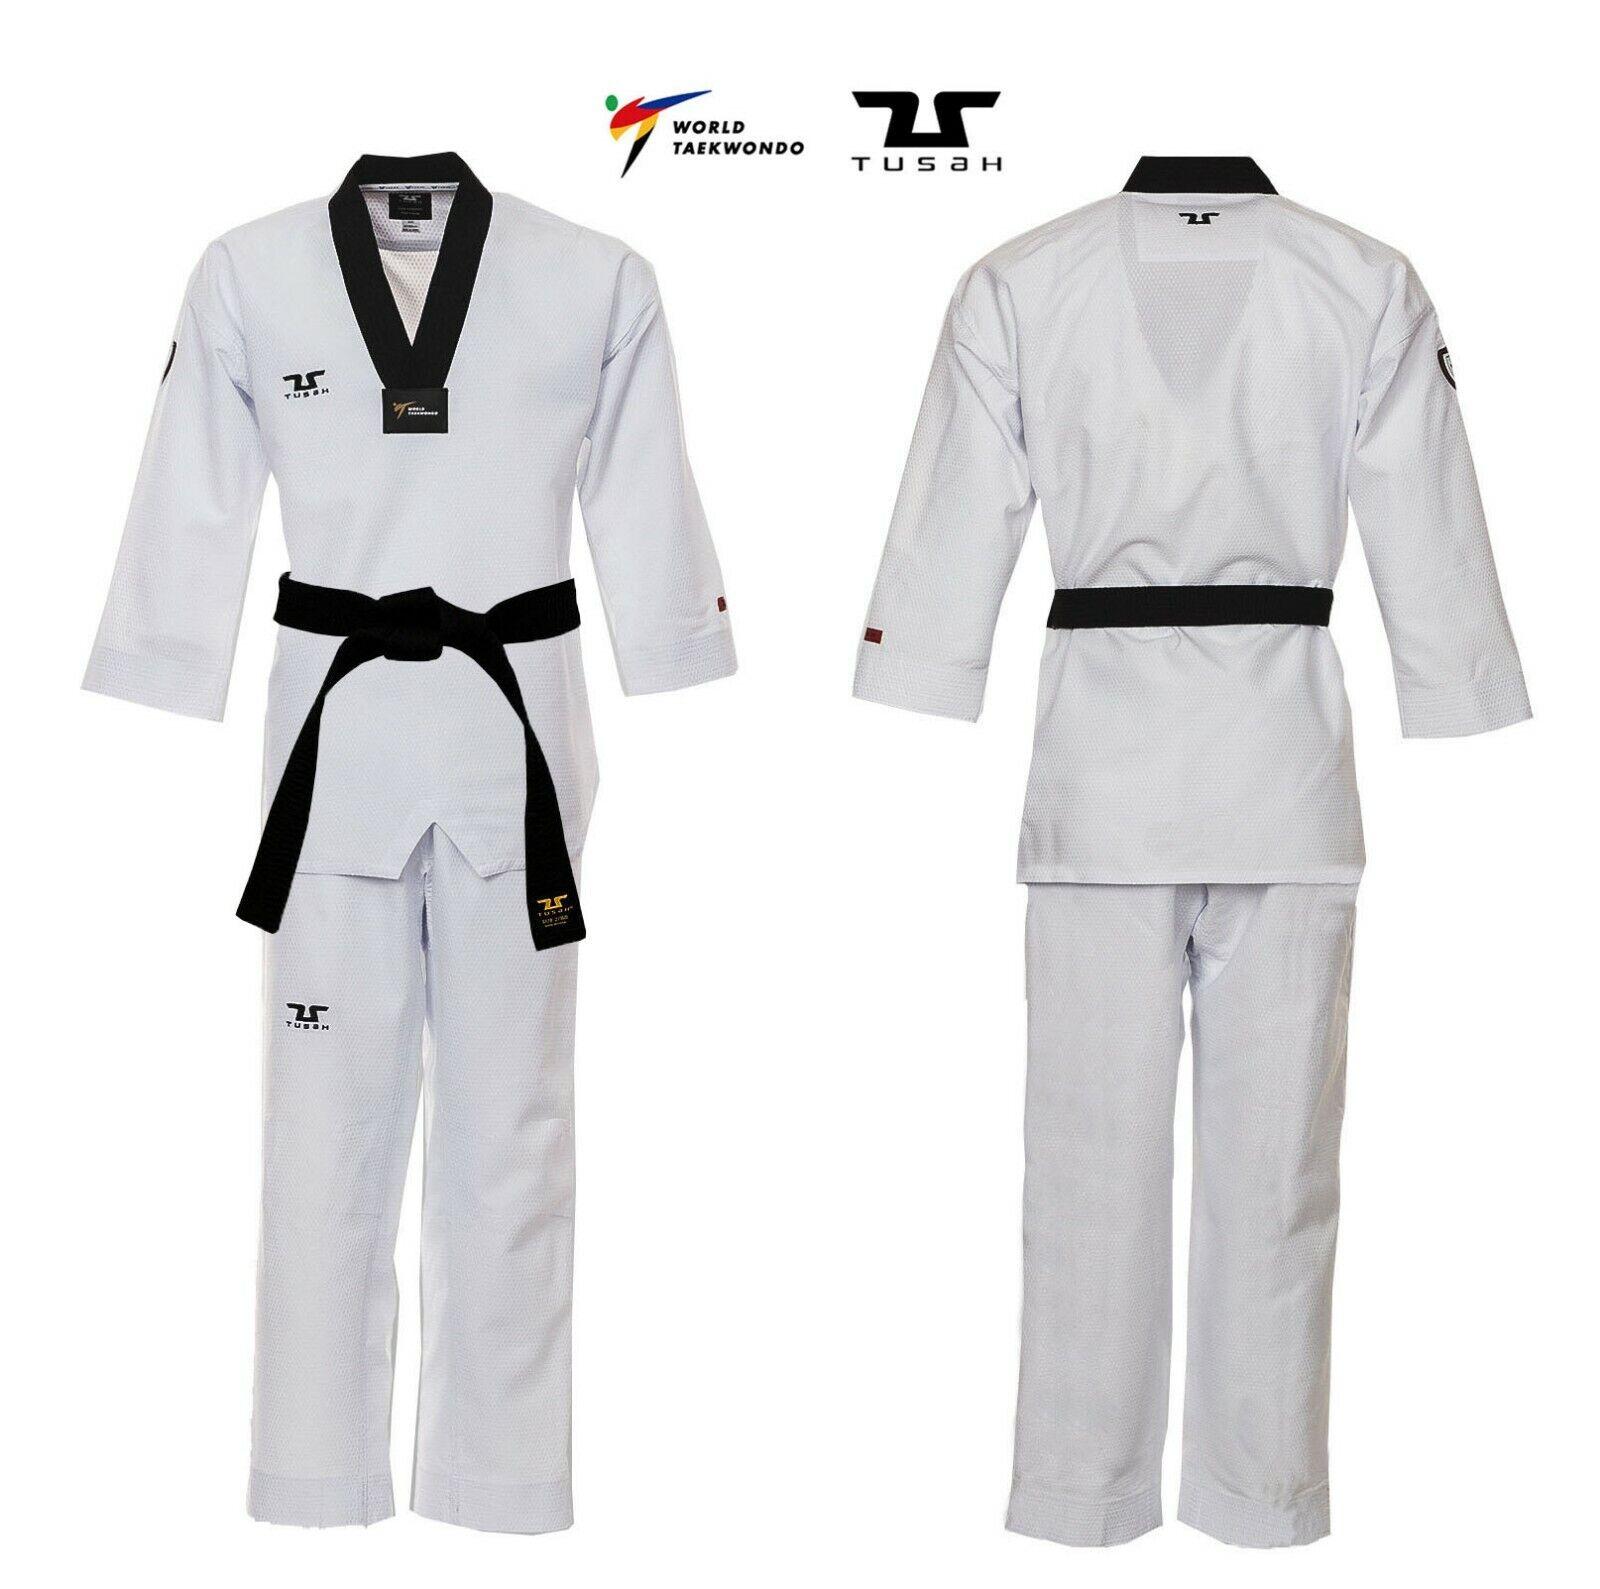 Dobok Professional Fighter Ultraleggero TUSAH uniforme Taekwondo OMOLOGATO WT